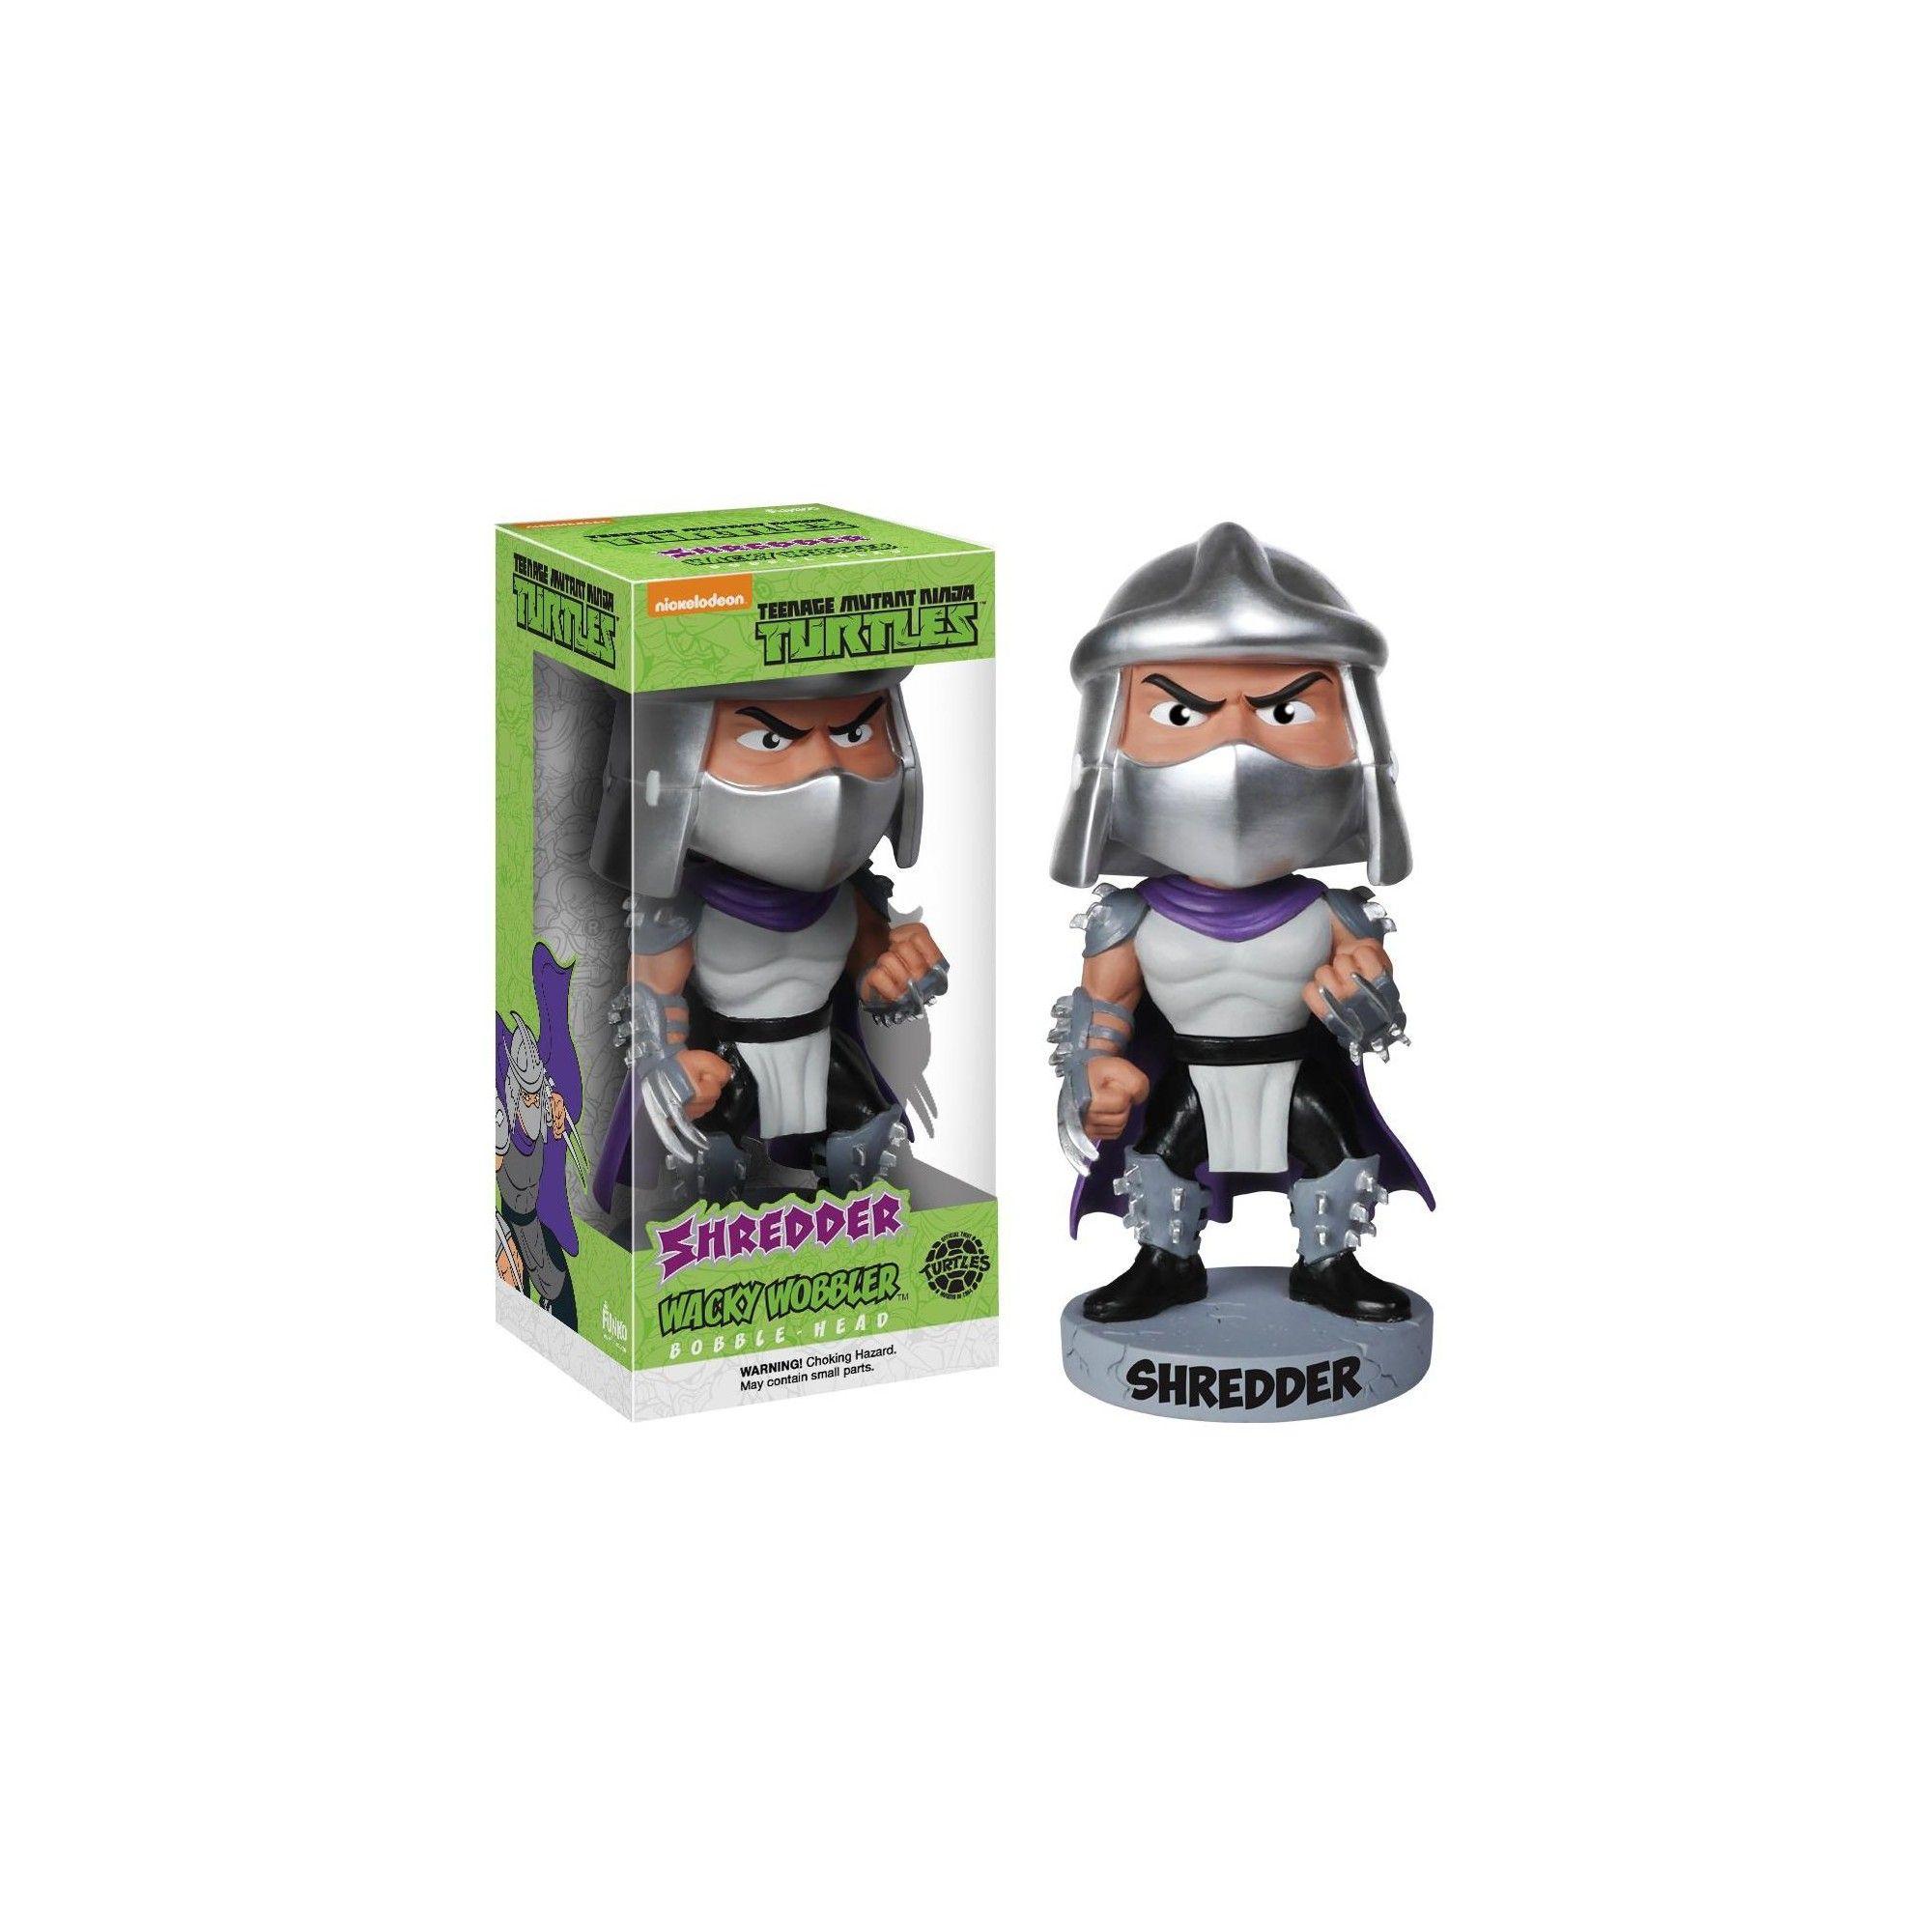 Funko--Teenage Mutant Ninja Turtles Shredder Wacky Wobbler